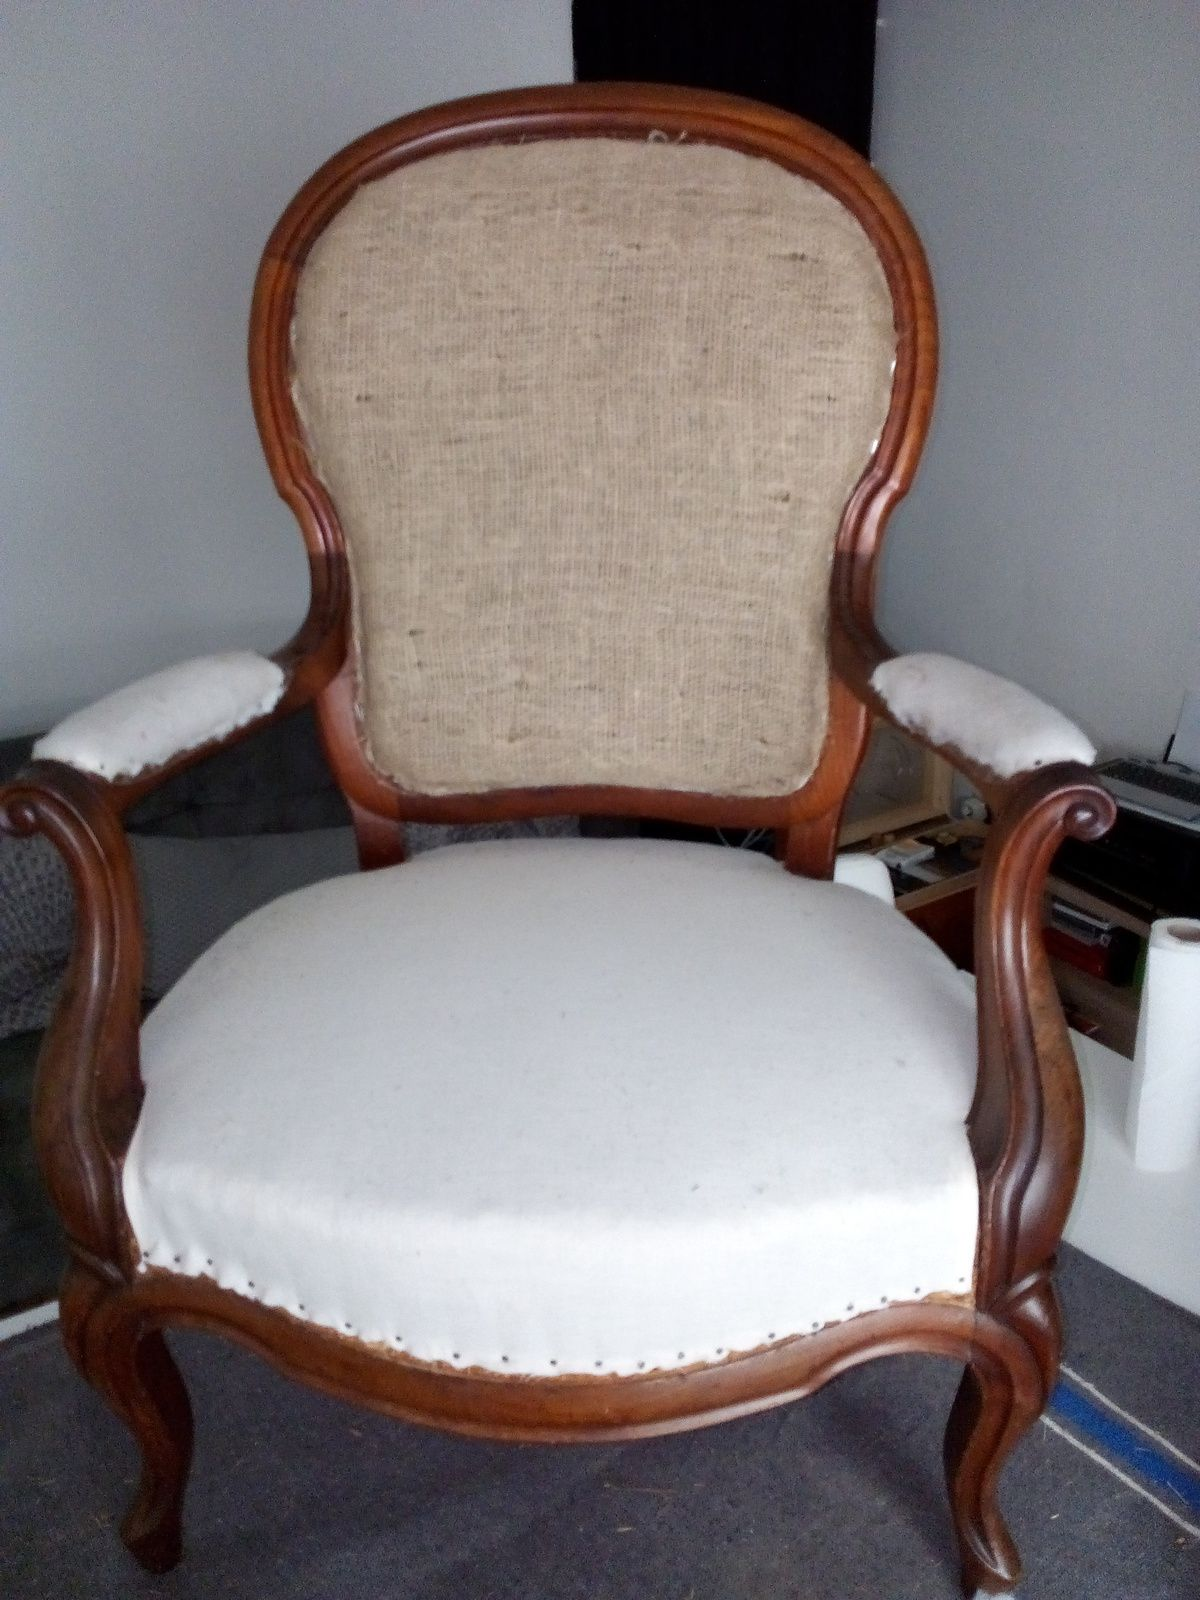 Fauteuil Louis Philippe, garniture traditionnelle, finition double-passepoil